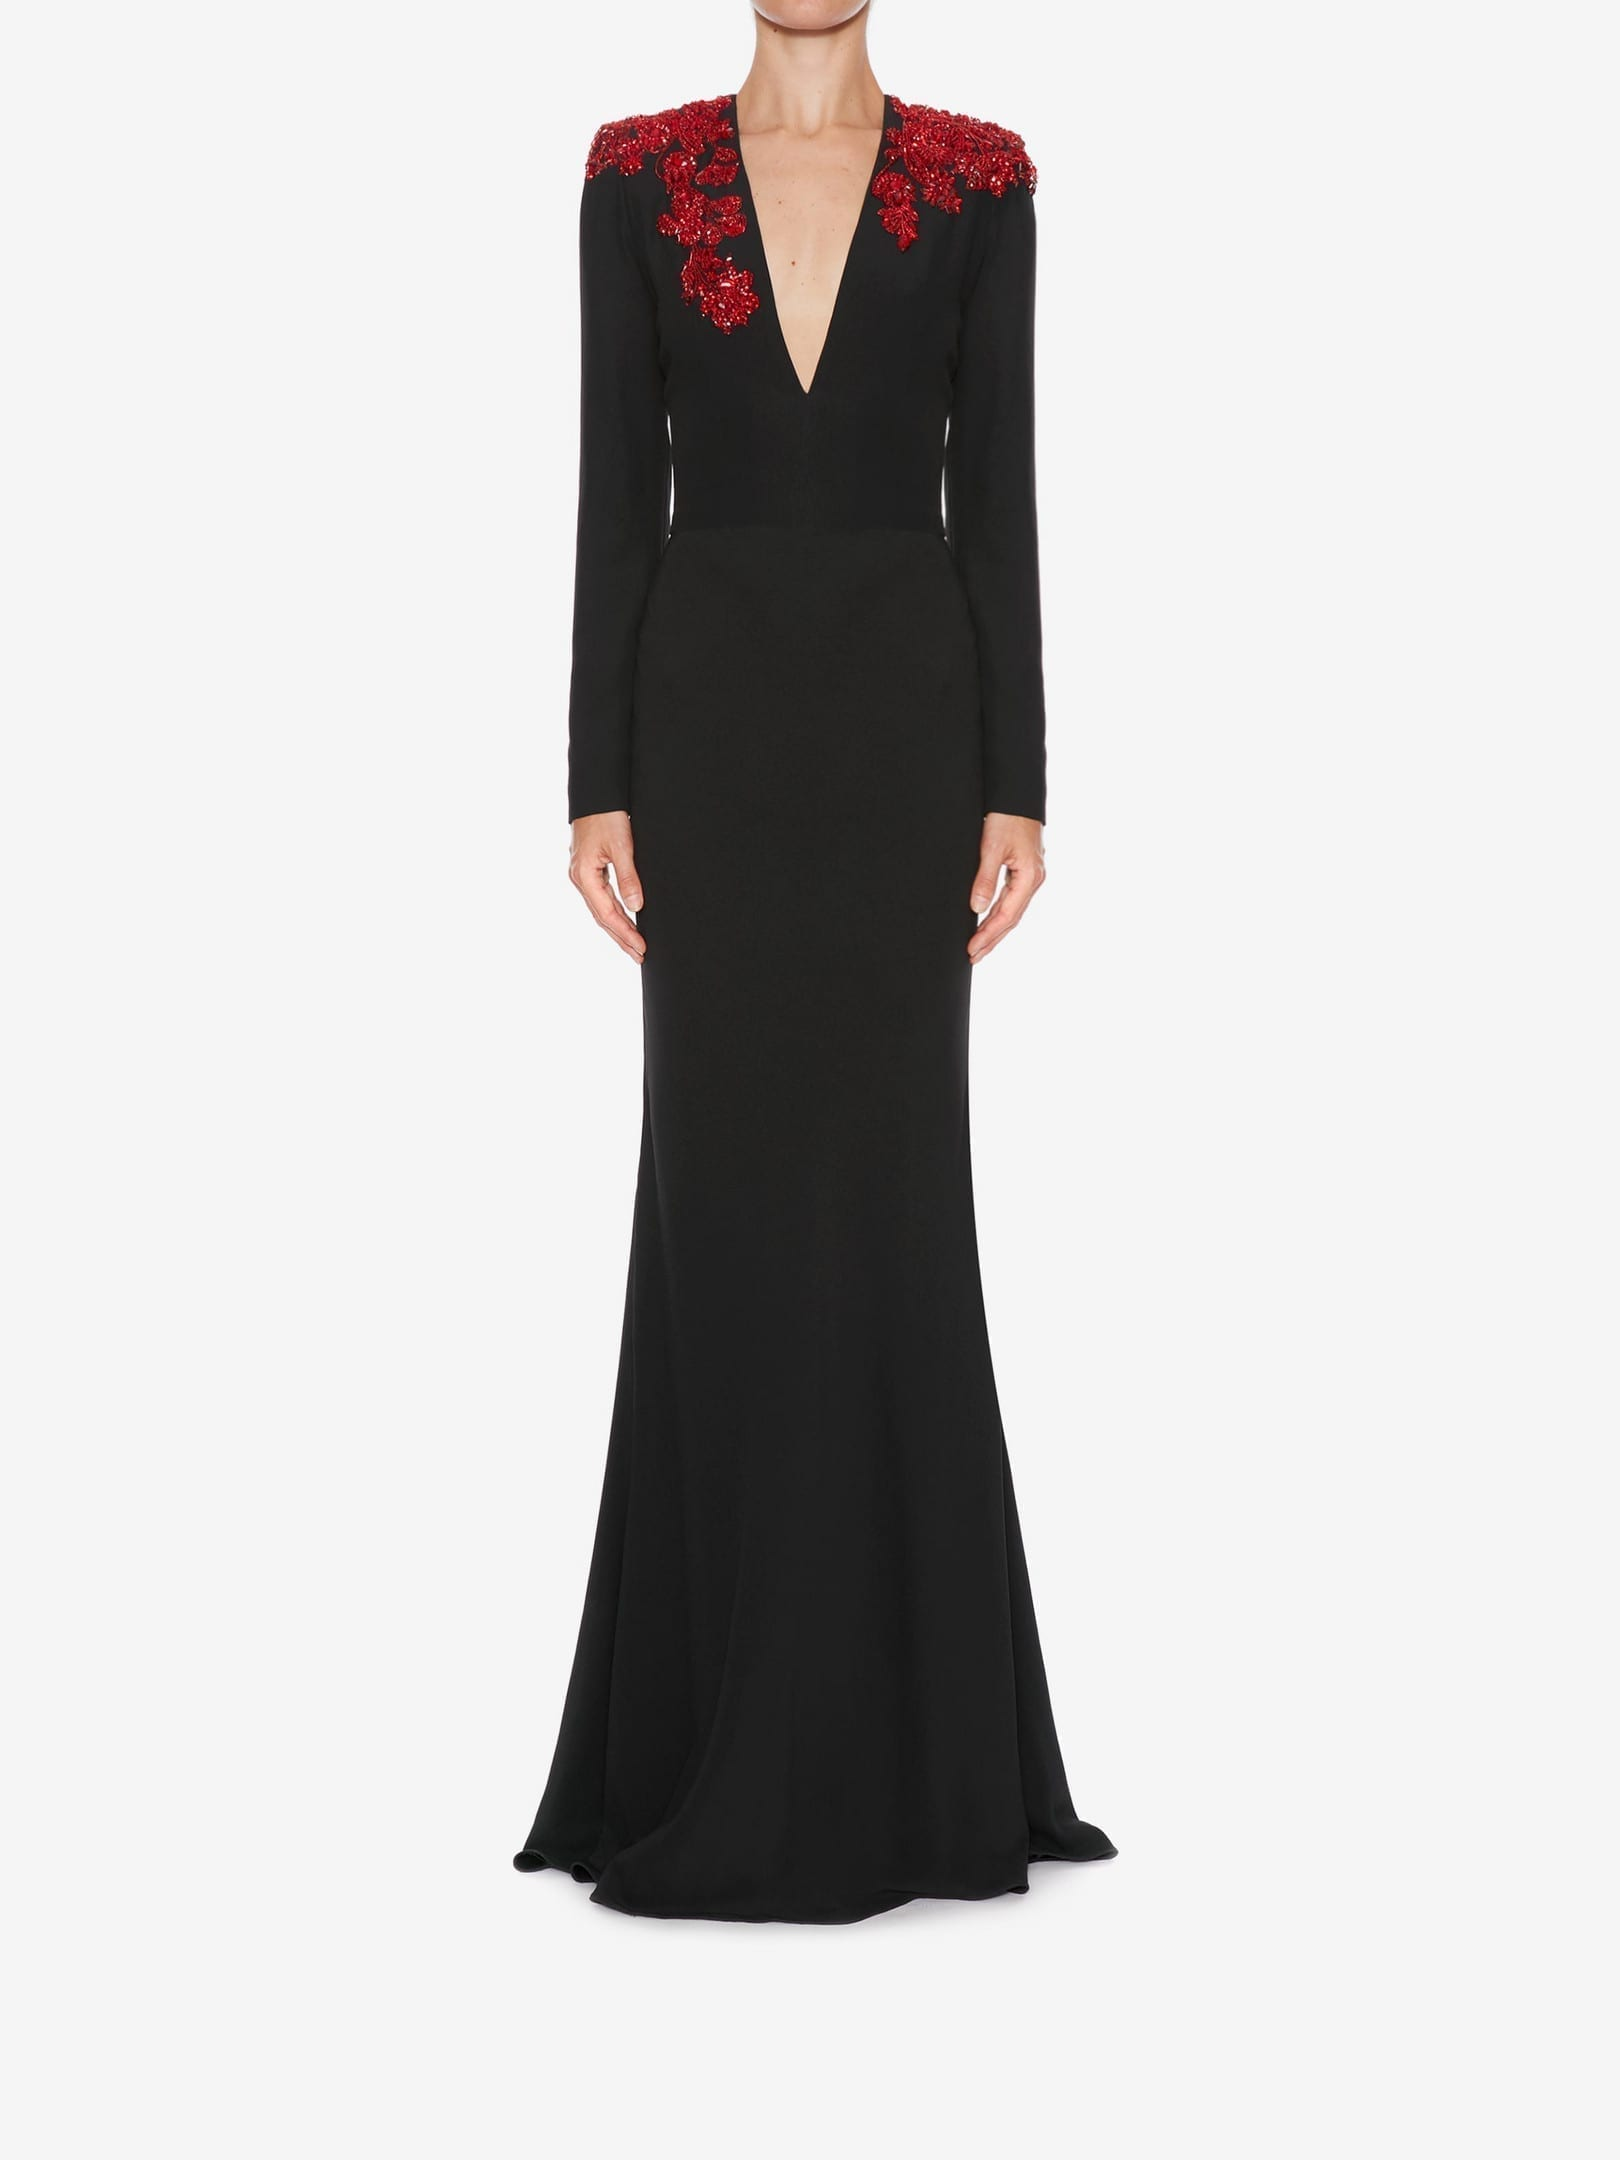 ALEXANDER MCQUEEN Cluster Embroidered Long Black Dress ...